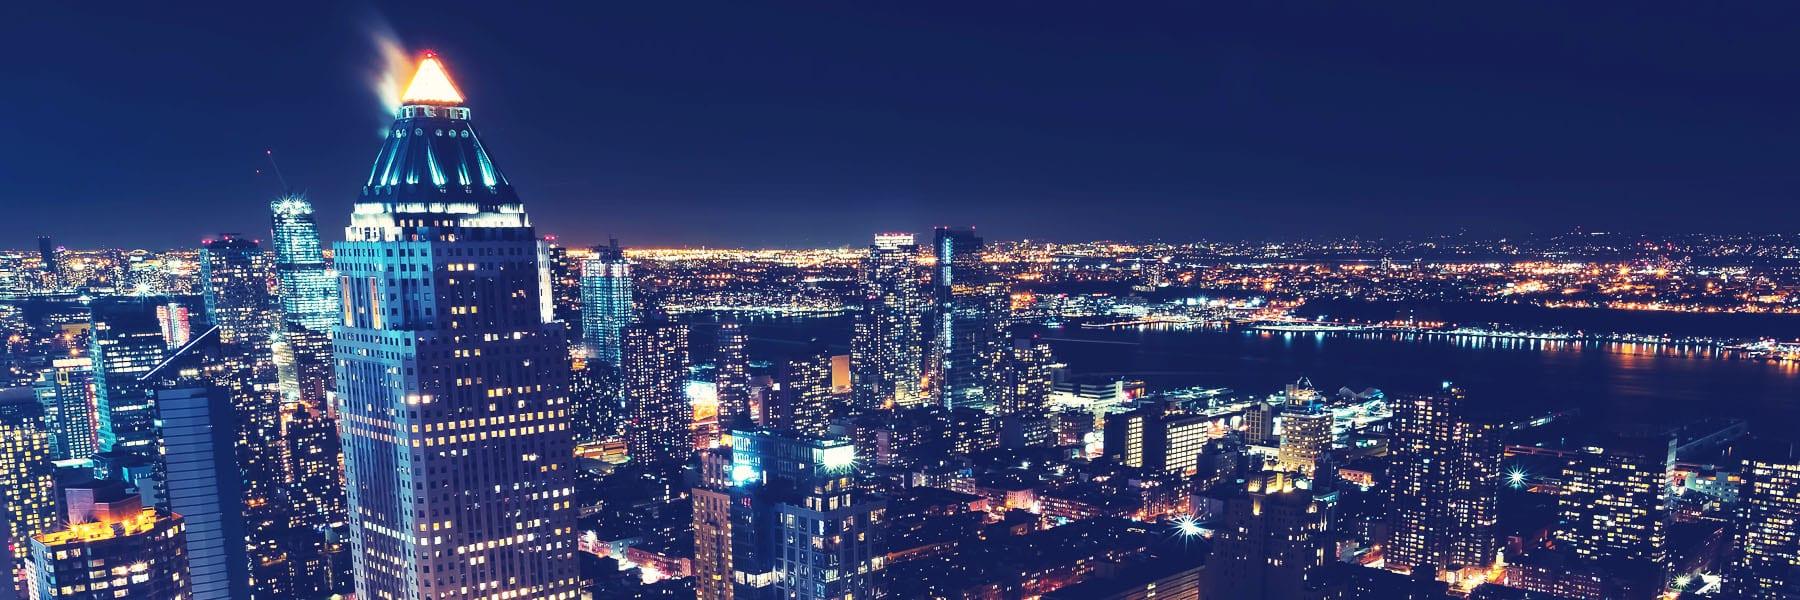 Panoramica Nocturna nueva york